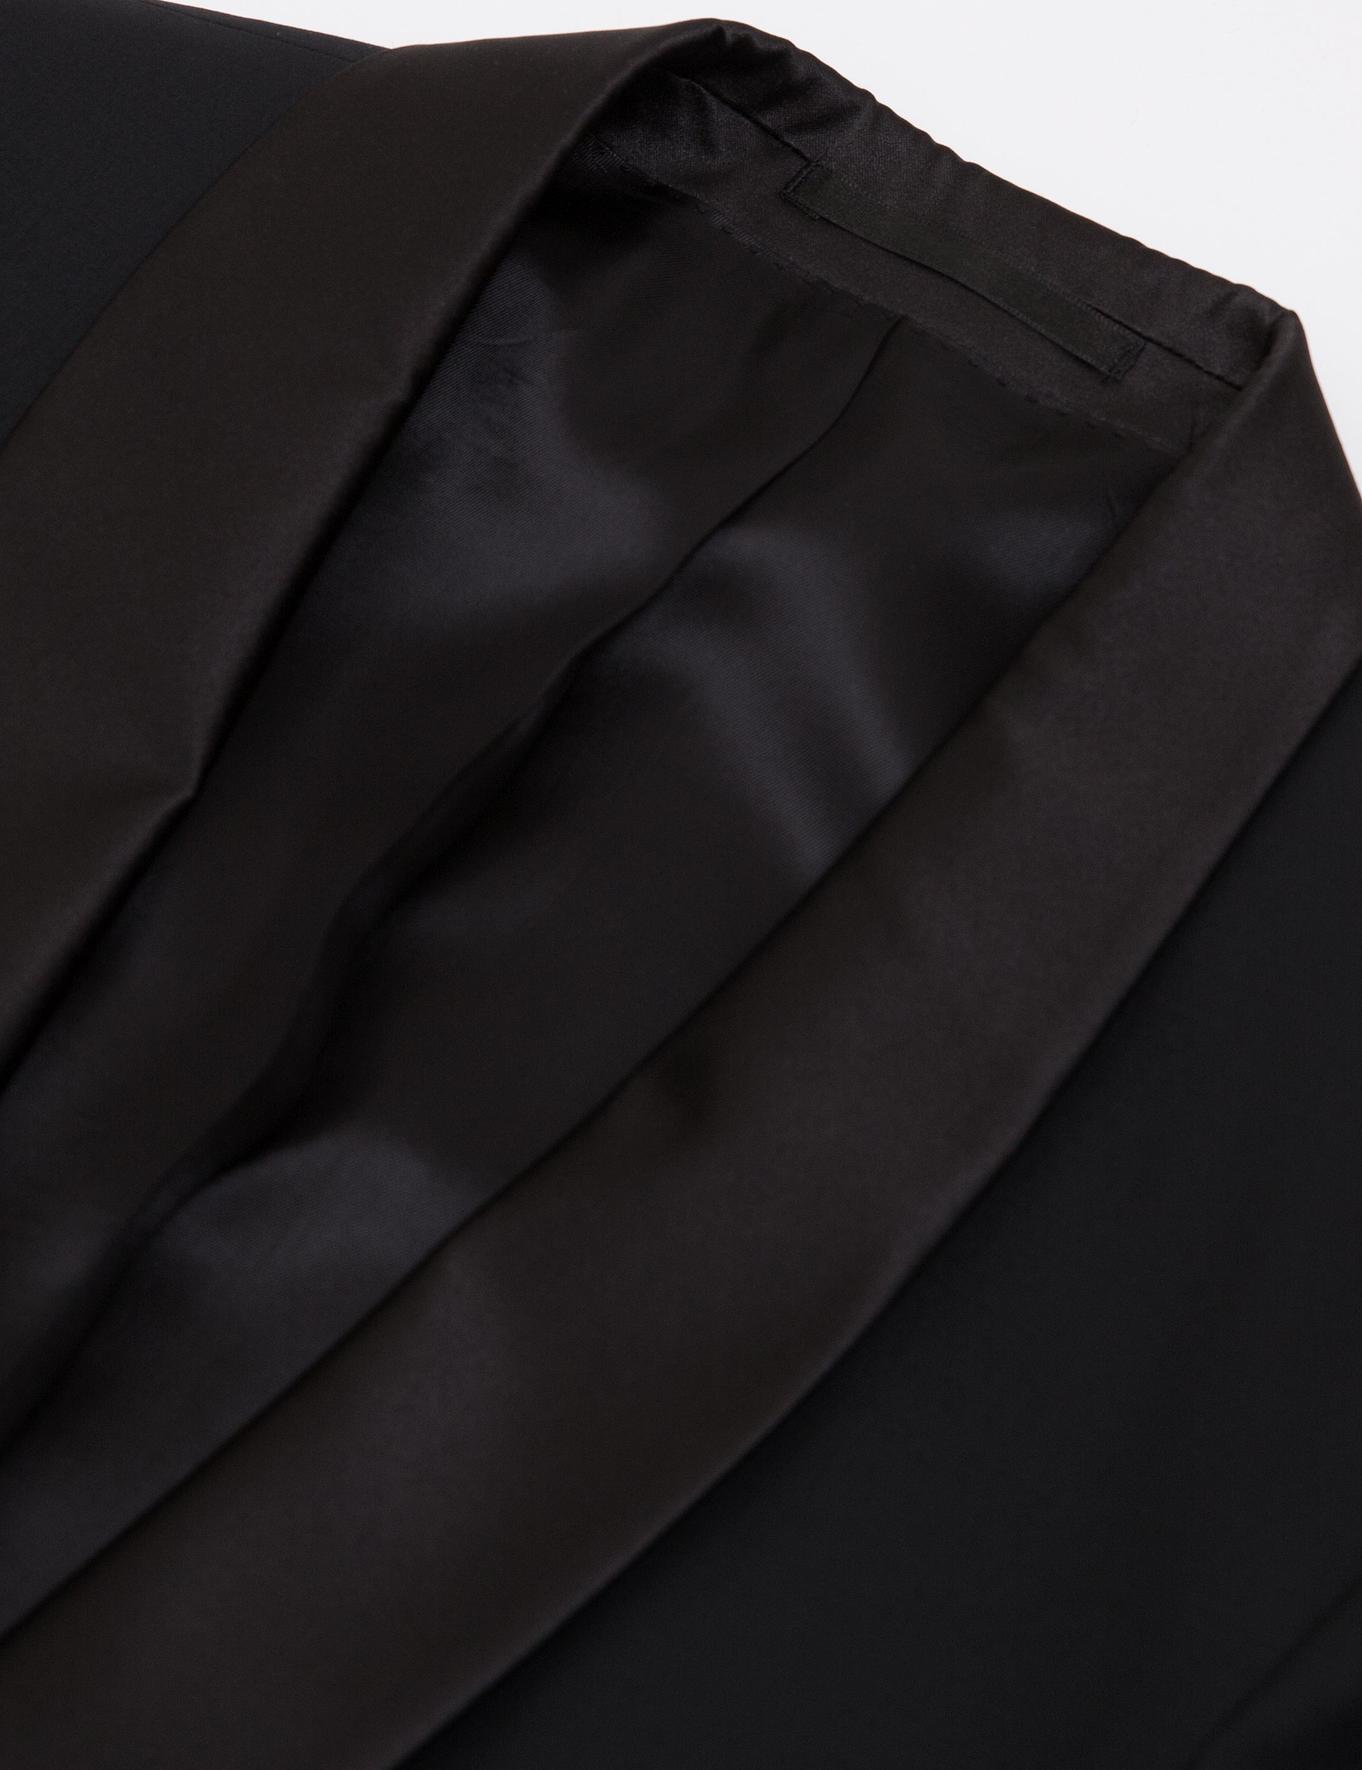 Siyah Slim Fit Ceket - 50187379018